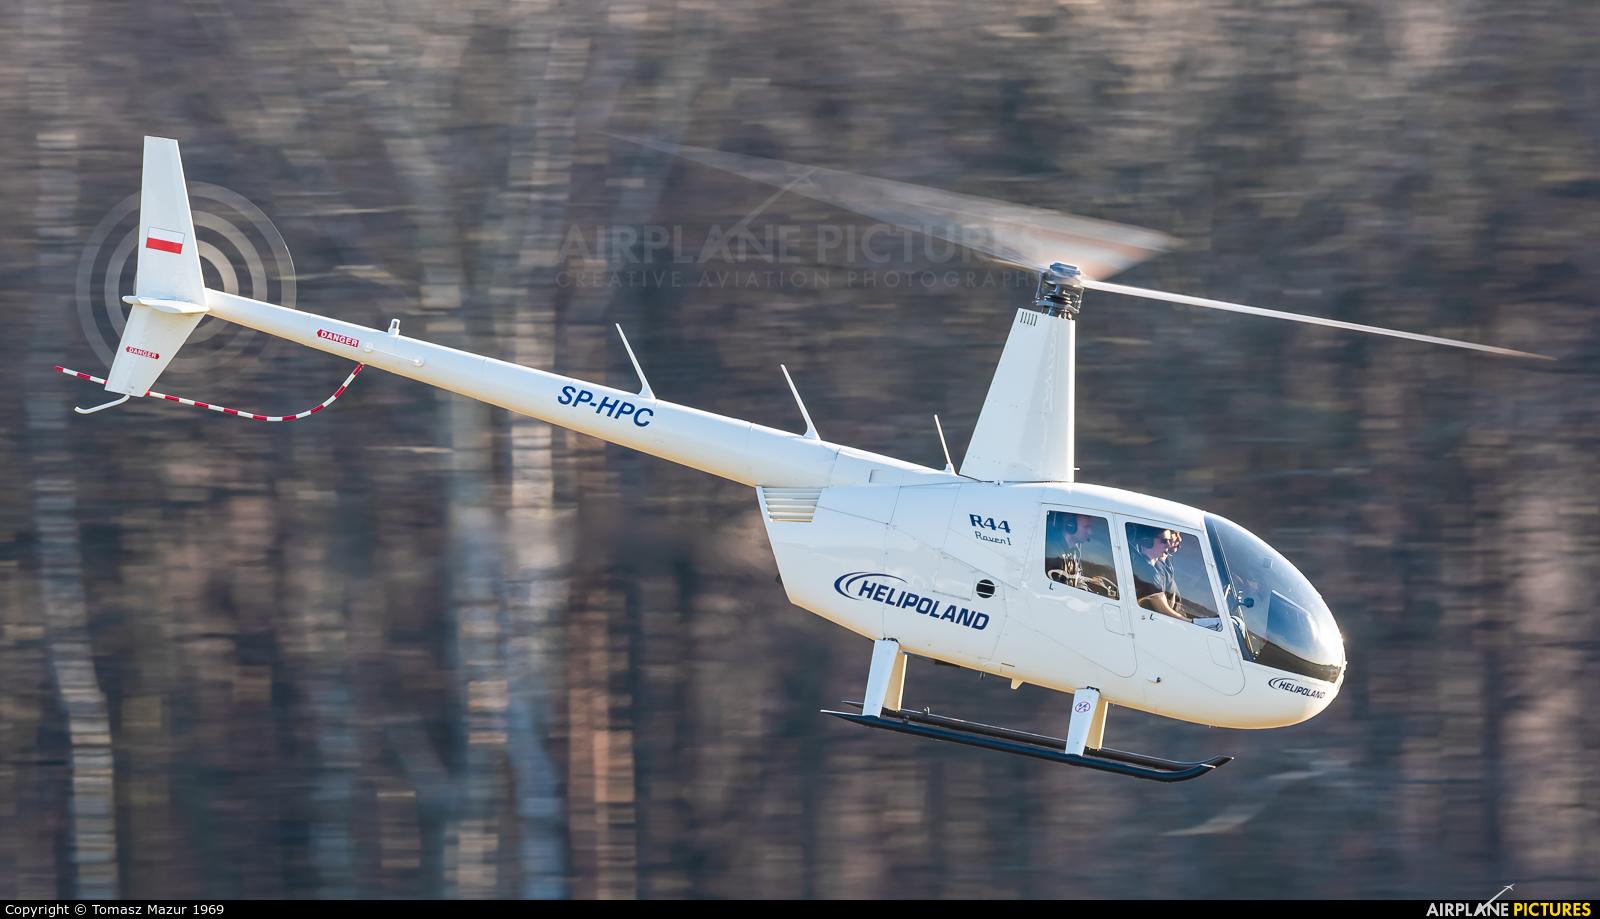 Helipoland SP-HPC aircraft at Rybnik - Gotartowice